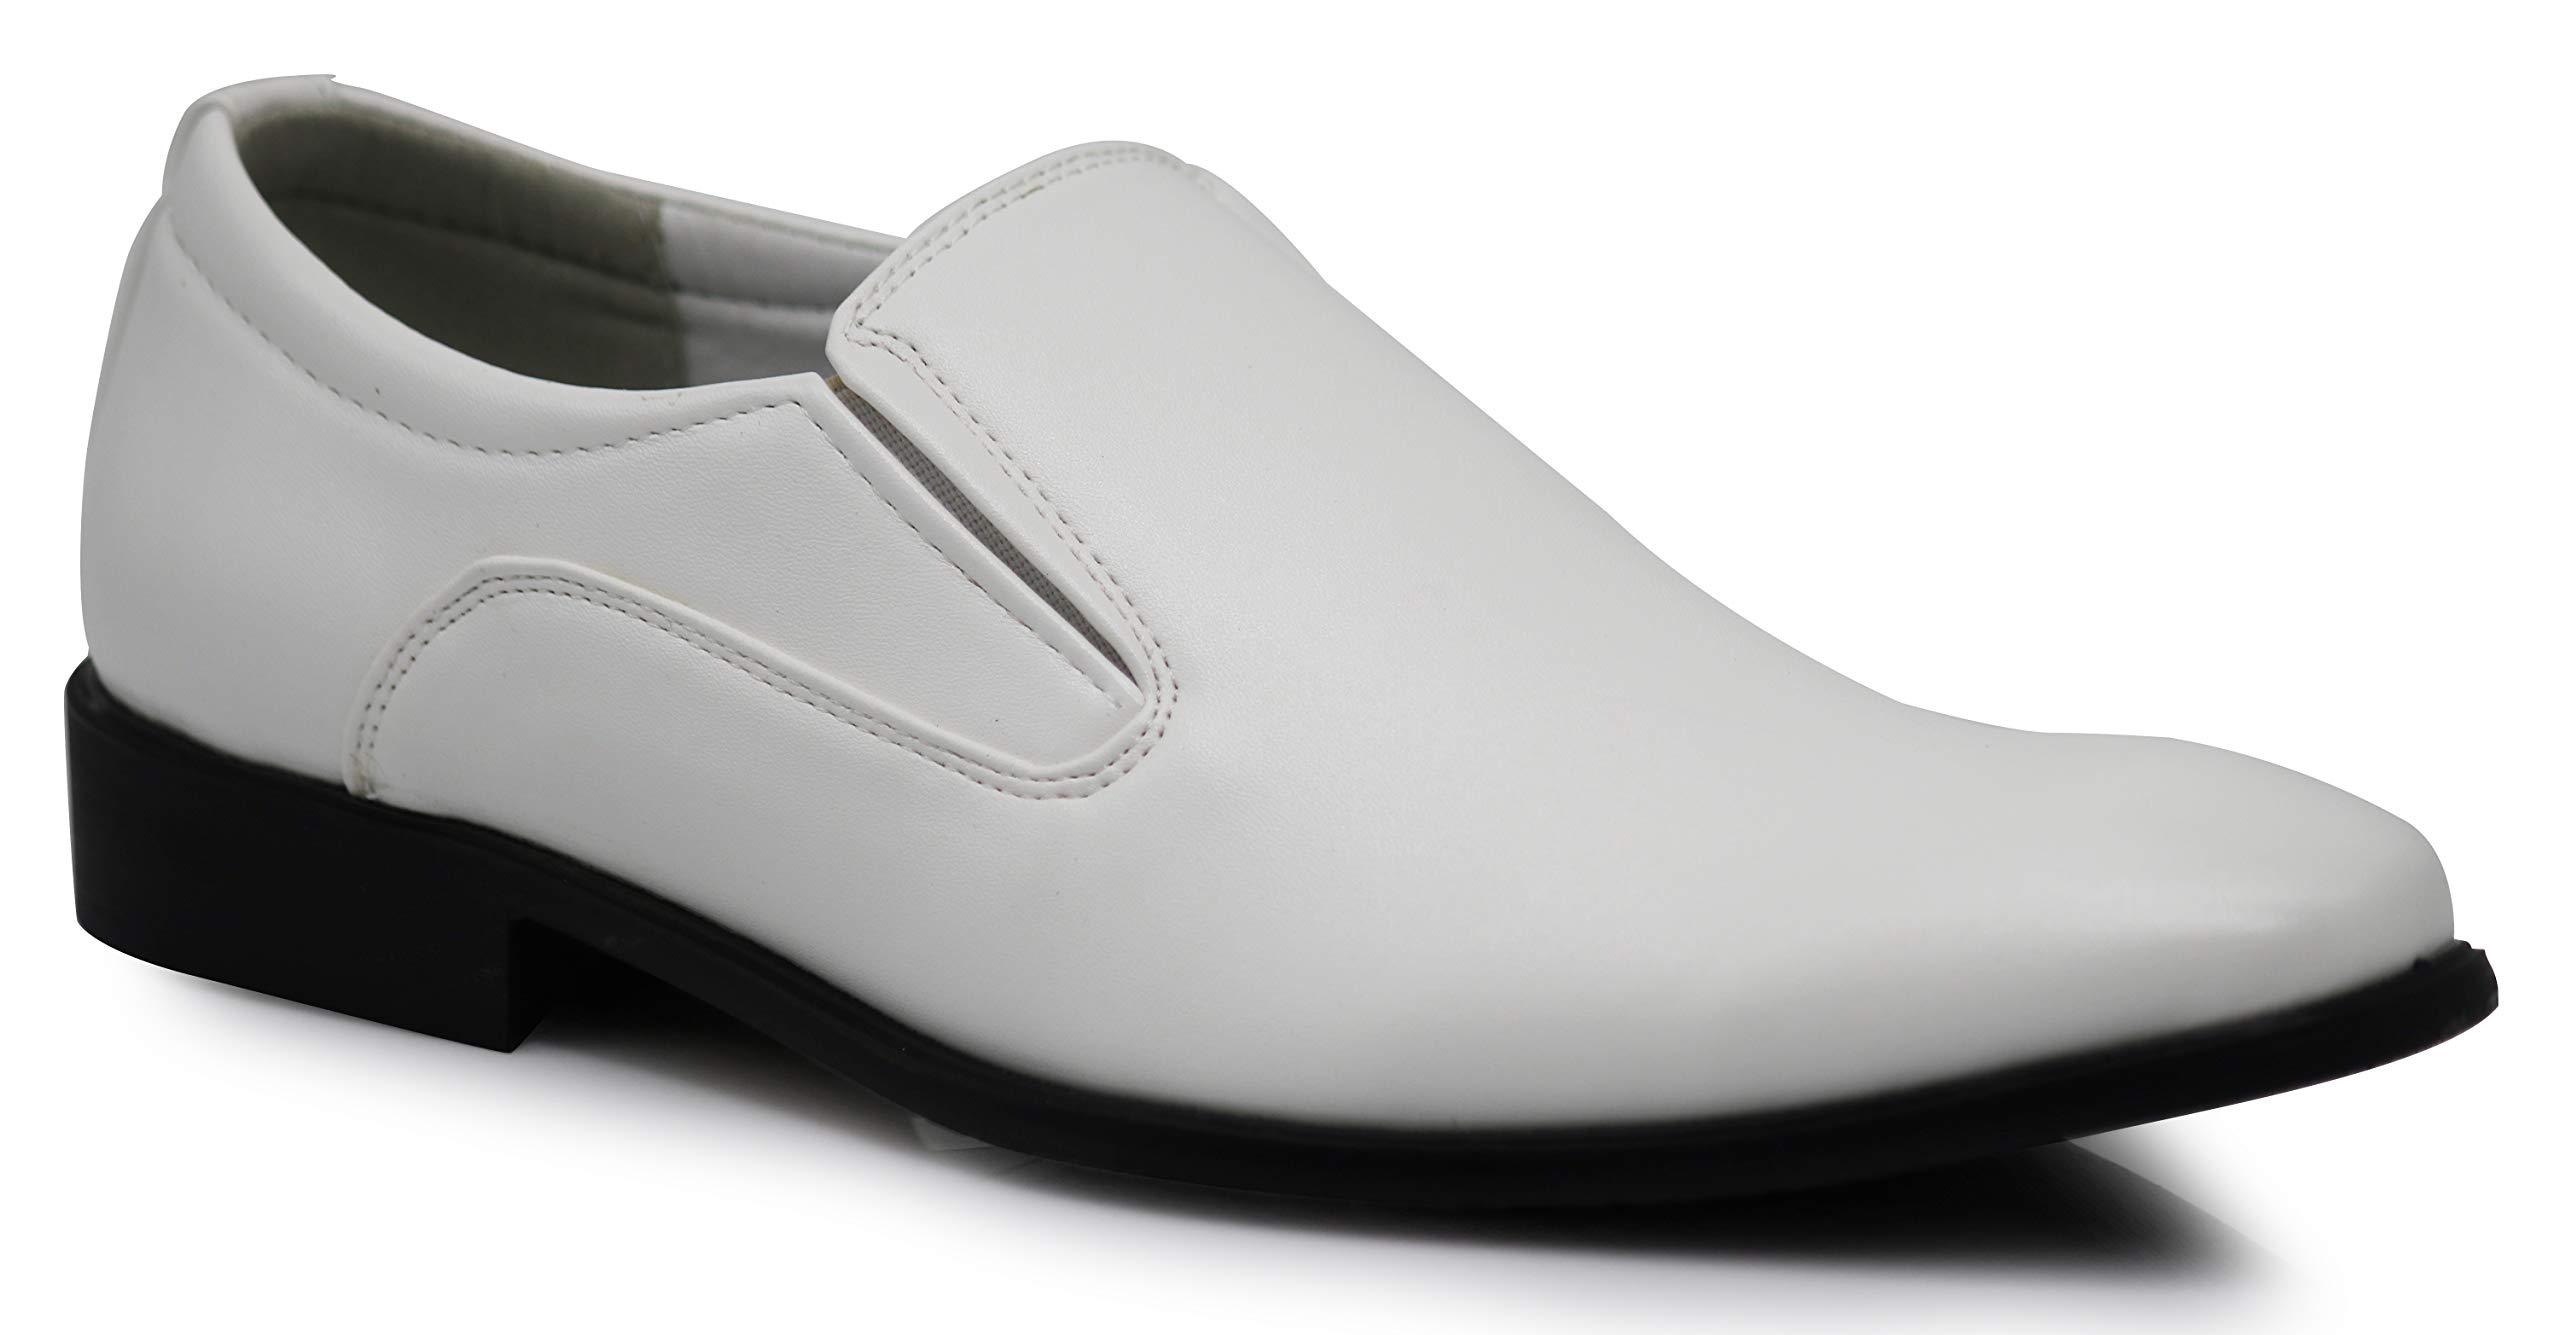 Enzo Romeo LK02 Men Dress Loafers Elastic Slip on Formal Round Toe Business Designer Shoes (10.5 D(M) US, White)